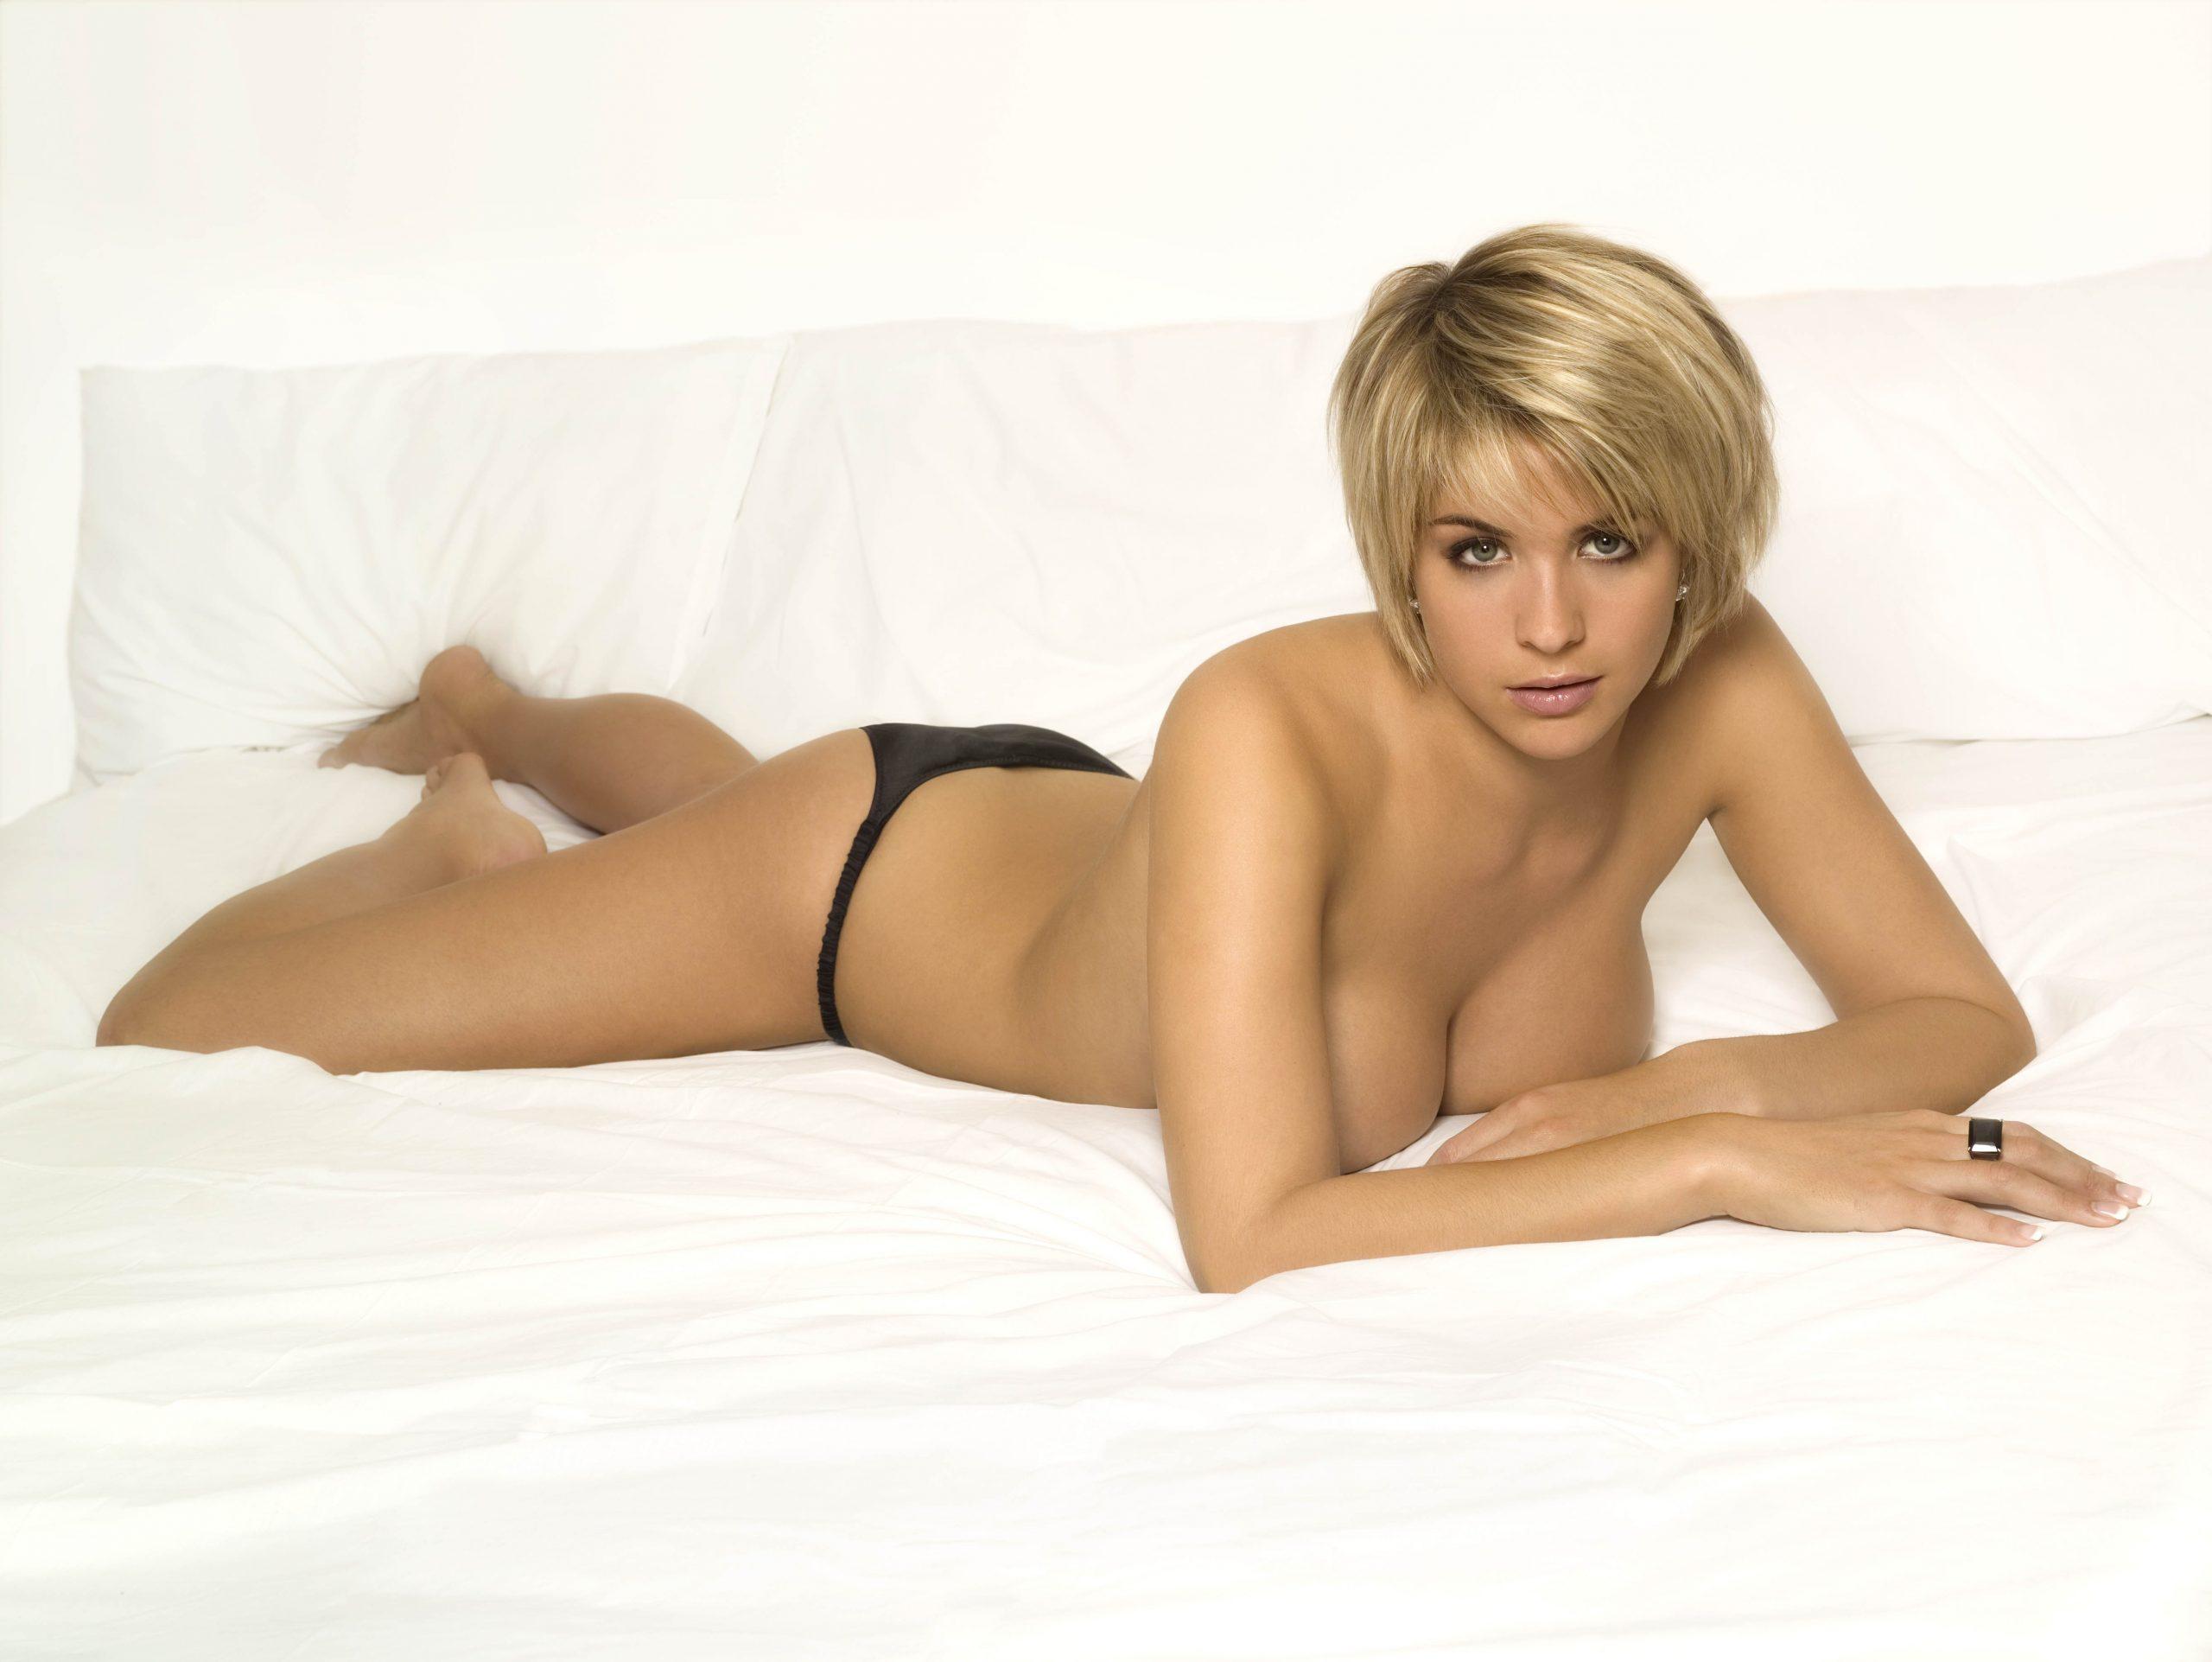 Gemma Atkinson Nude Wallpapers